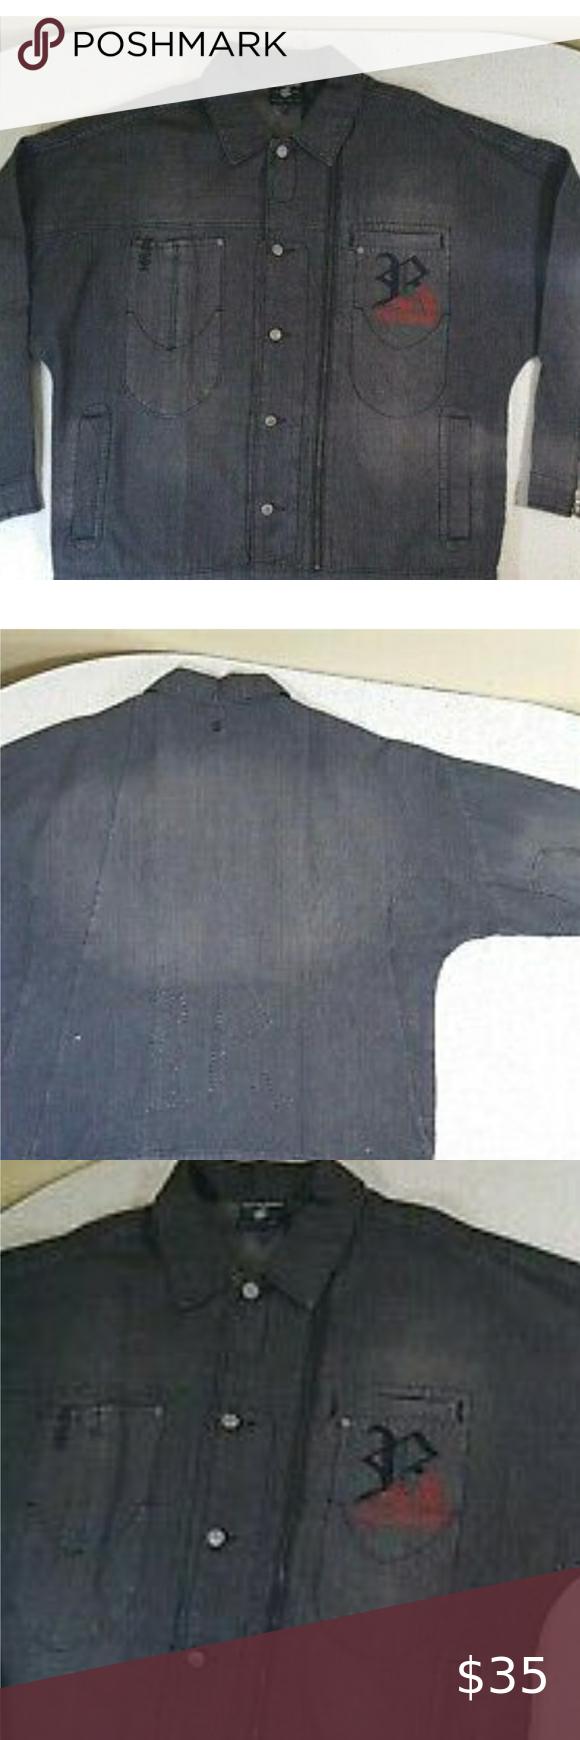 Rocawear Trucker Denim Jacket Extra Large Item Description Rocawear Mens Trucker Denim Jacket Size X Large Black Button Up Embro Denim Jacket Jackets Rocawear [ 1740 x 580 Pixel ]